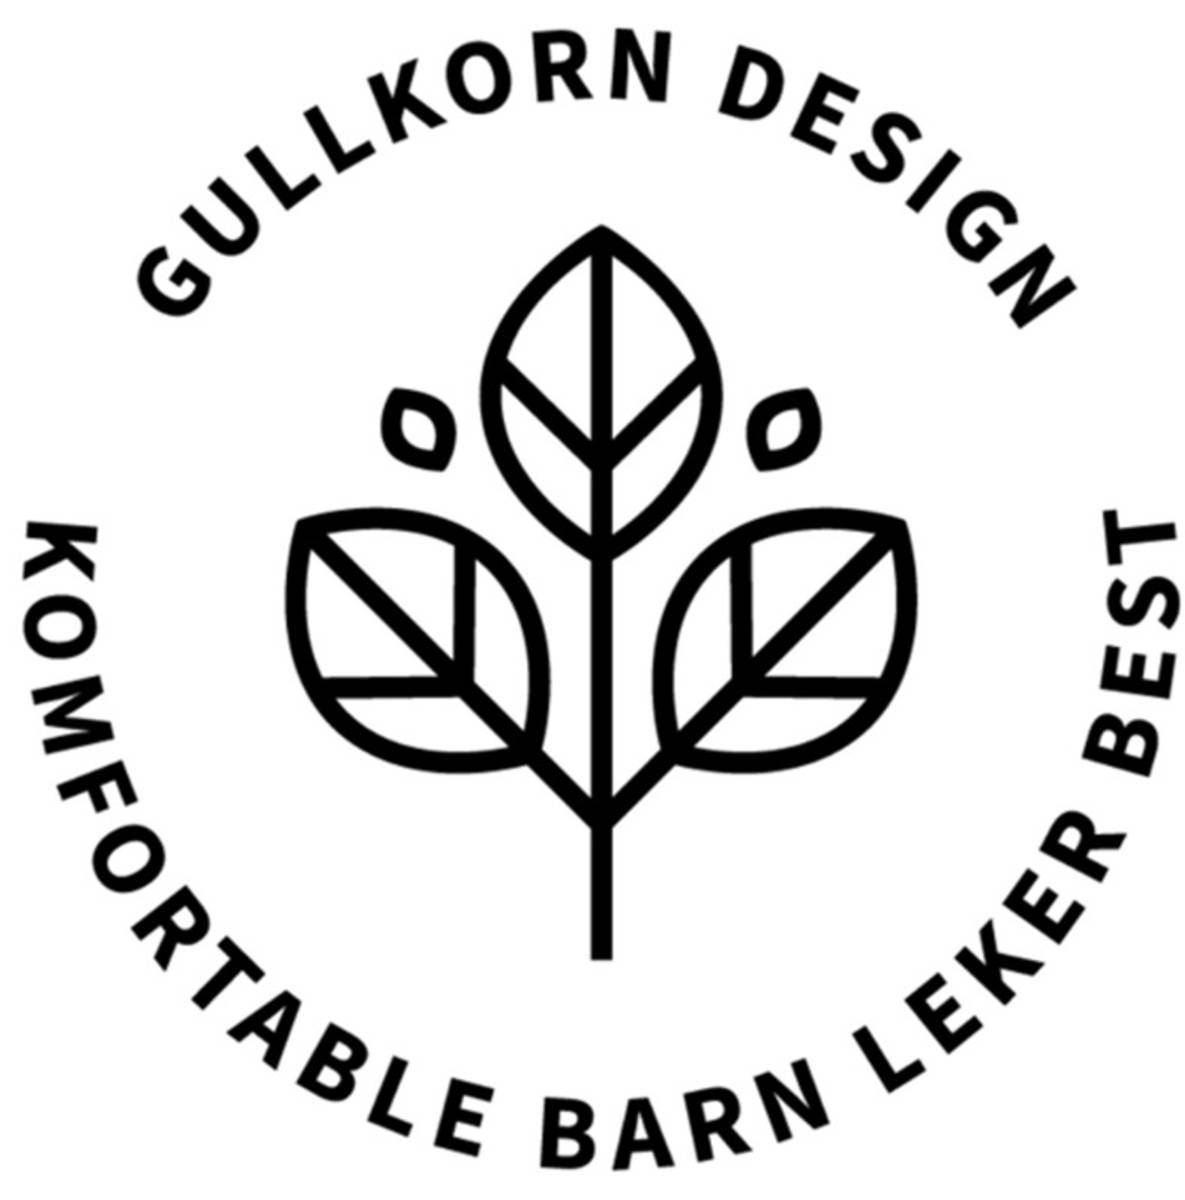 GULLKORN DESIGN - SHORTS VILLVETTE, MAIBLÅ